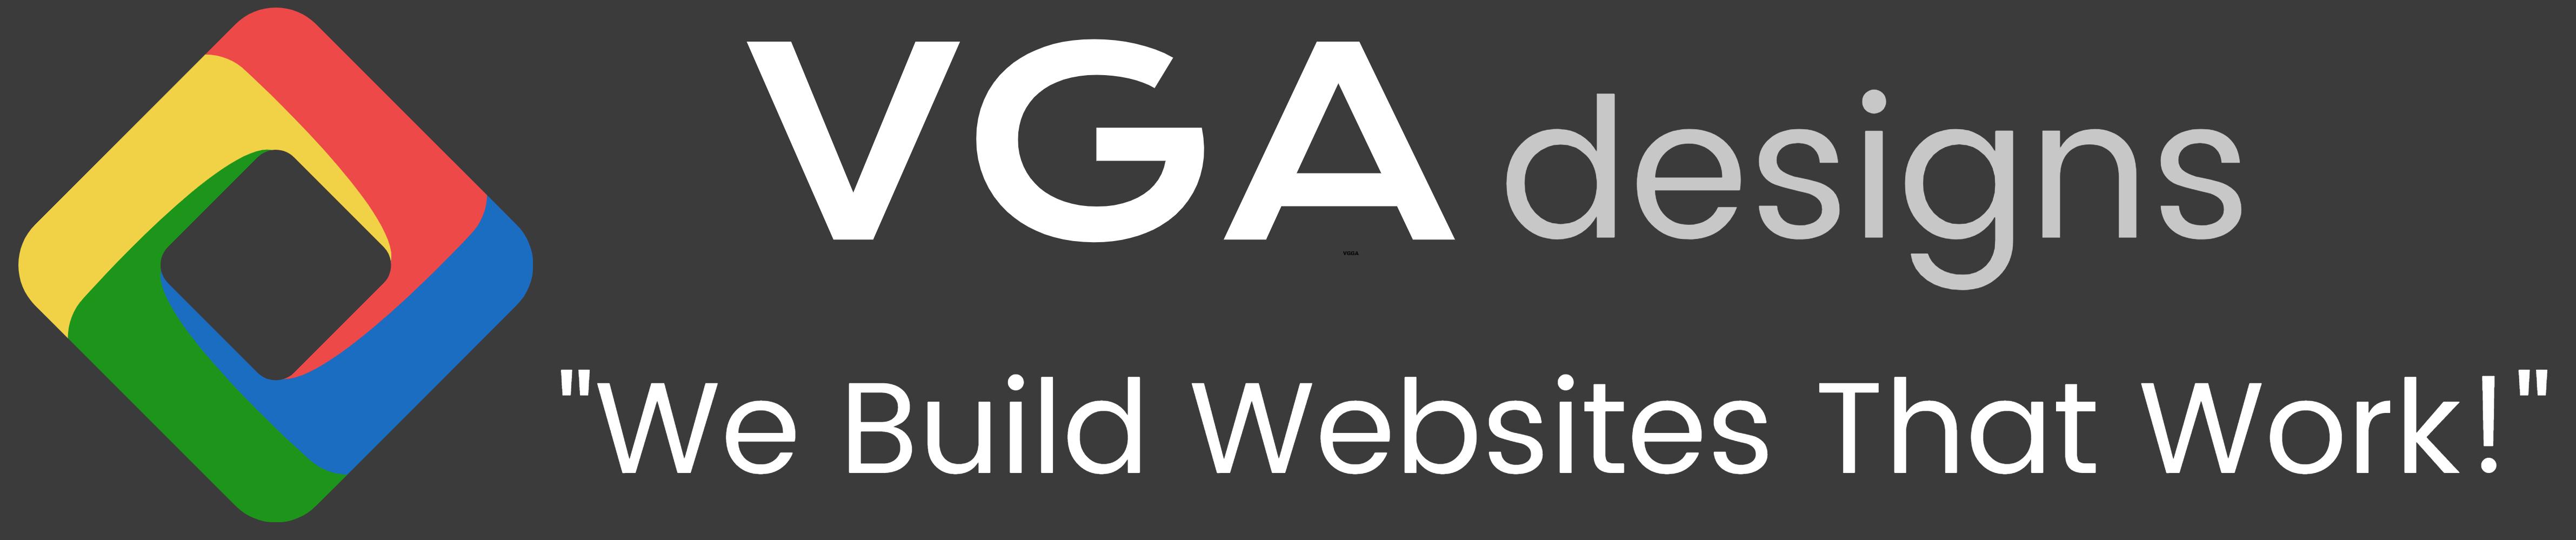 VGA Designs